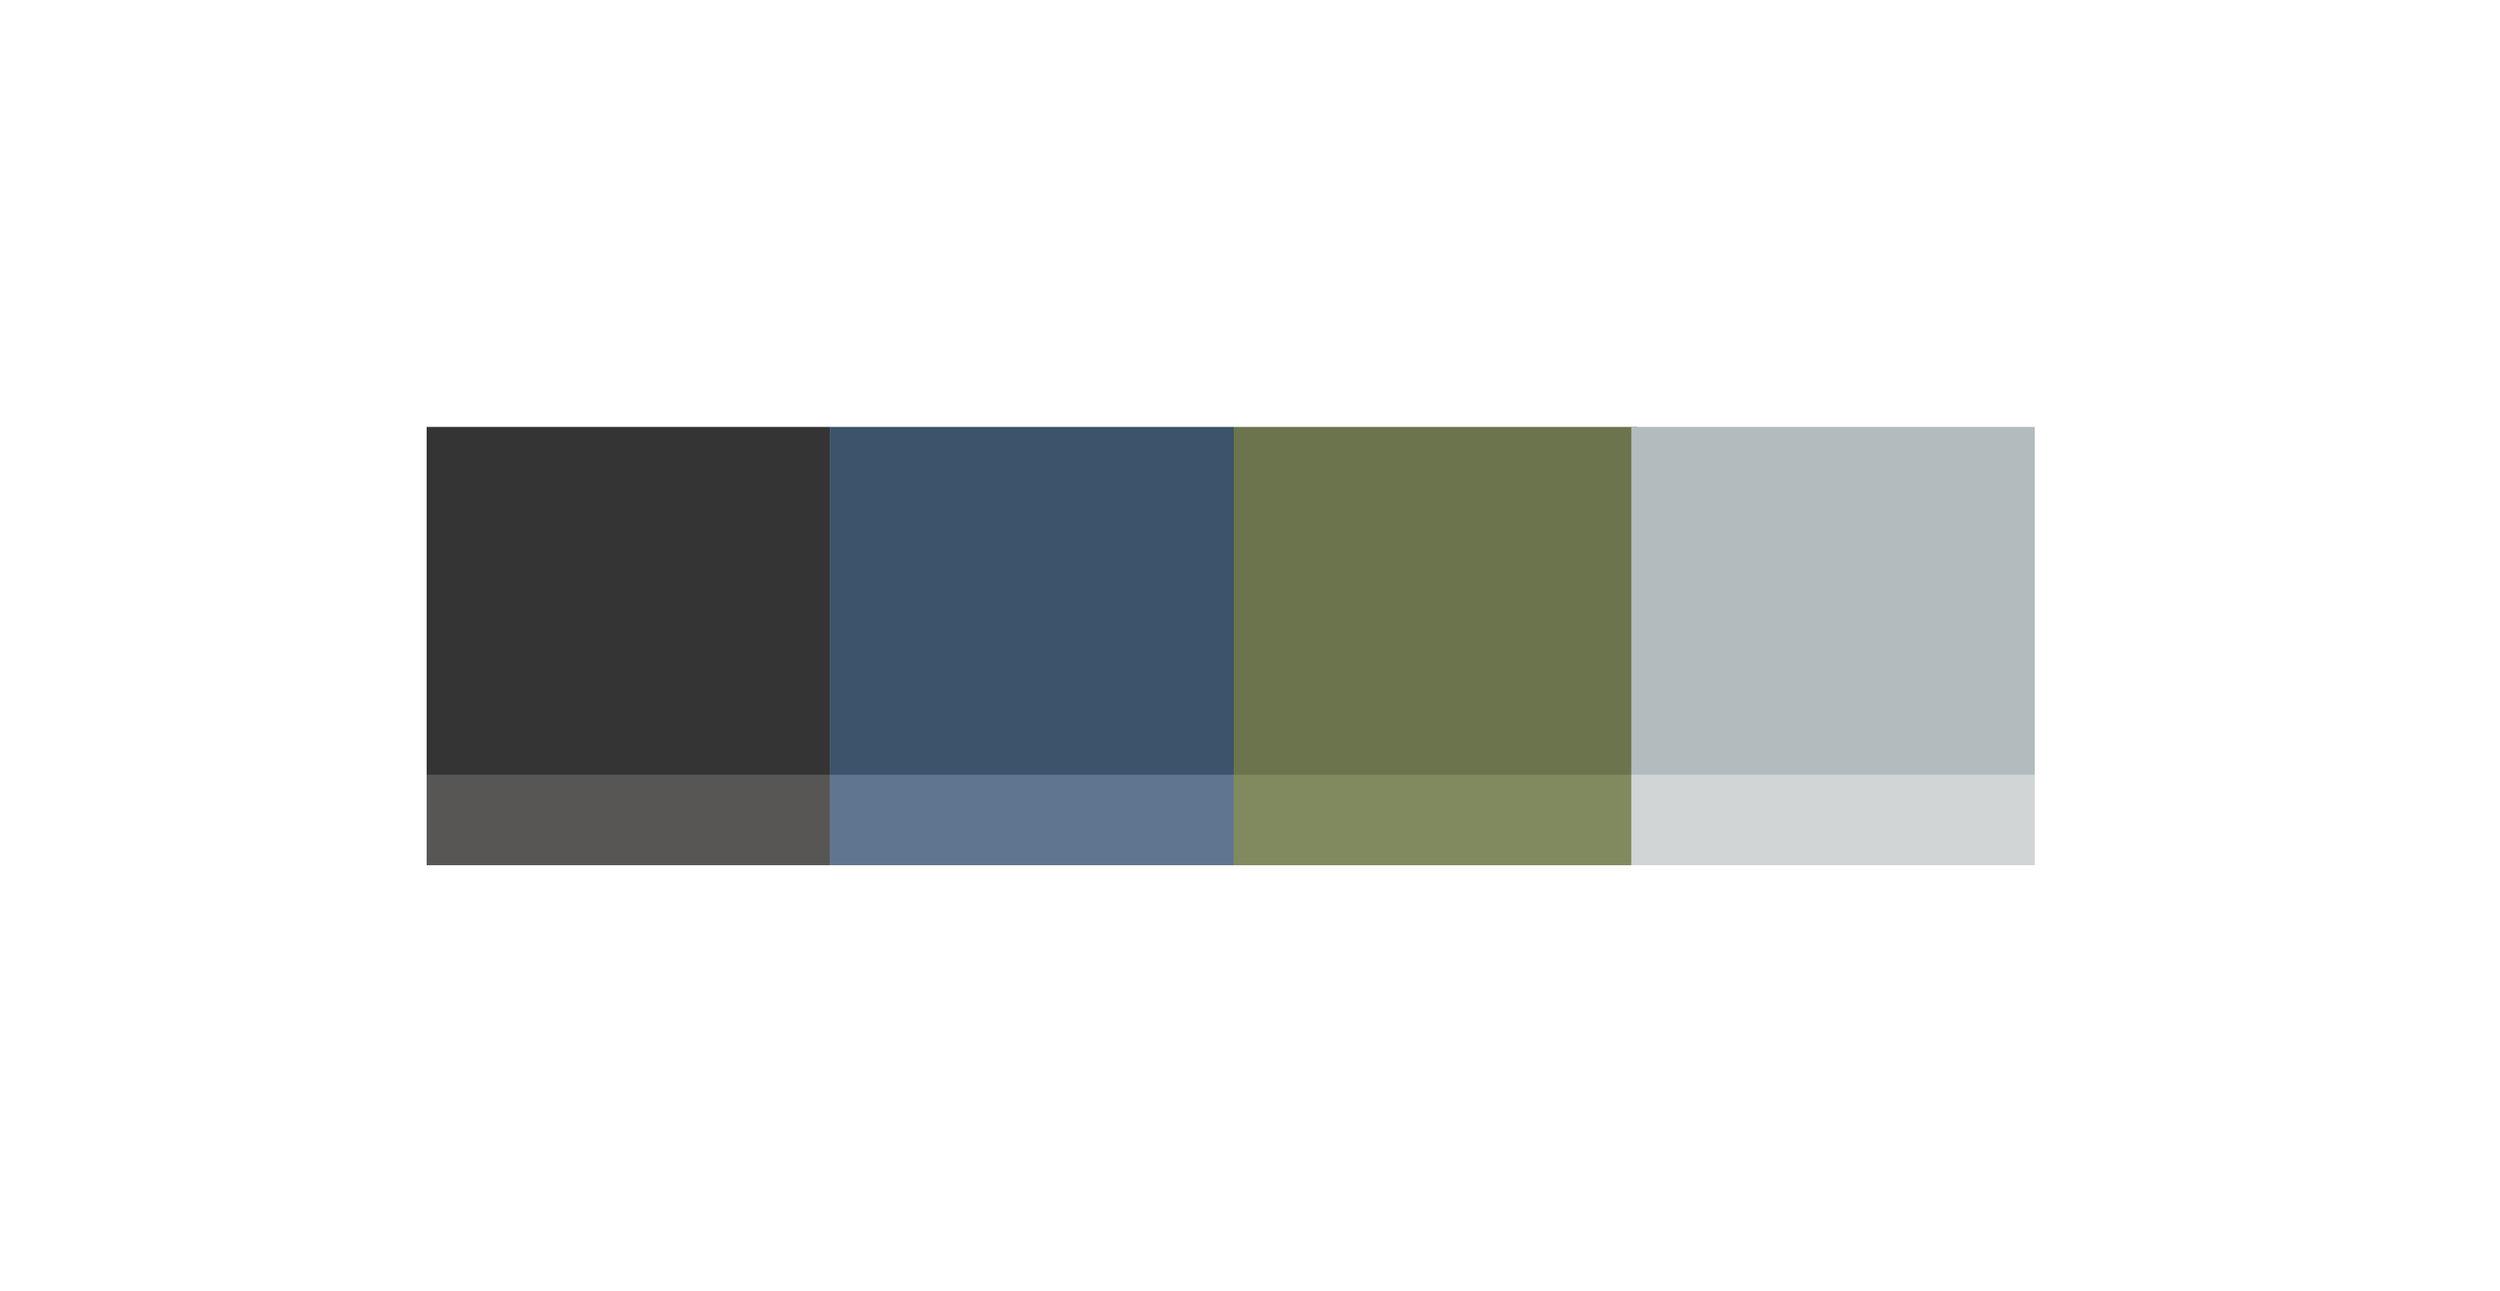 LynseyCreative_ASantillanDesigns_Portfolio_colorpalette.jpg